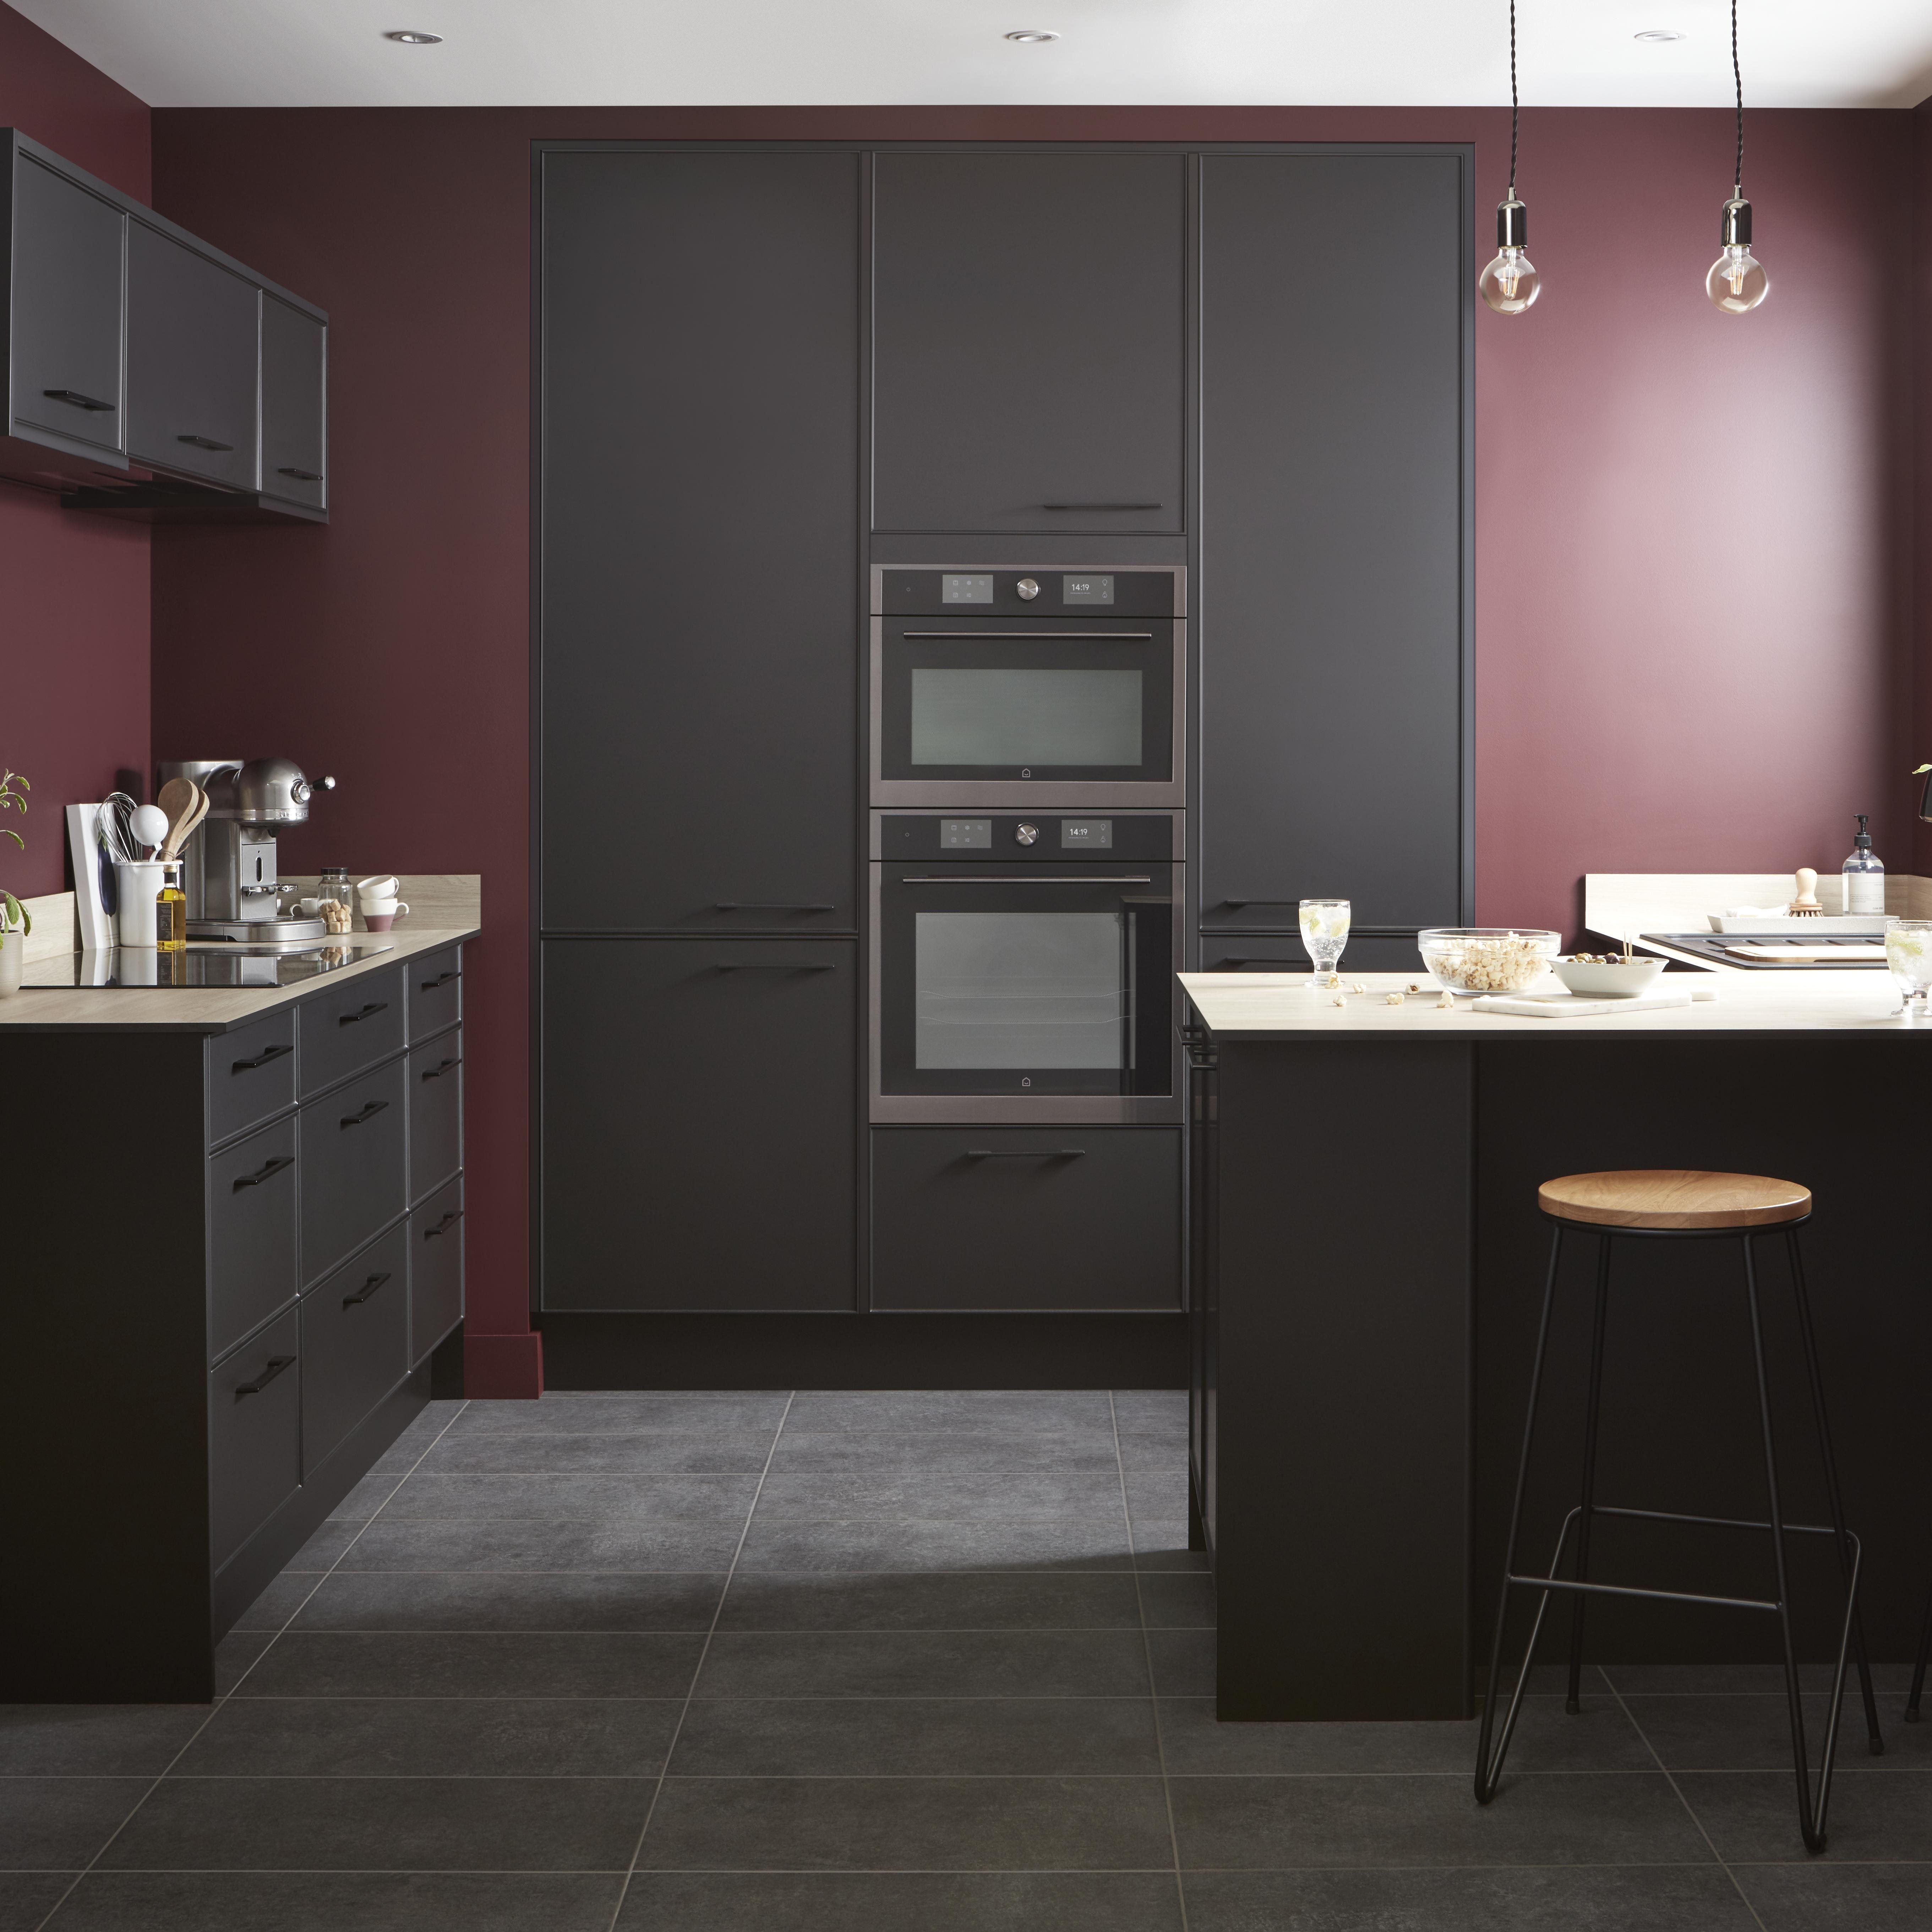 Merlot Magic Trend In 2020 Kitchen Fittings Diy Desk Decor Laminate Worktop